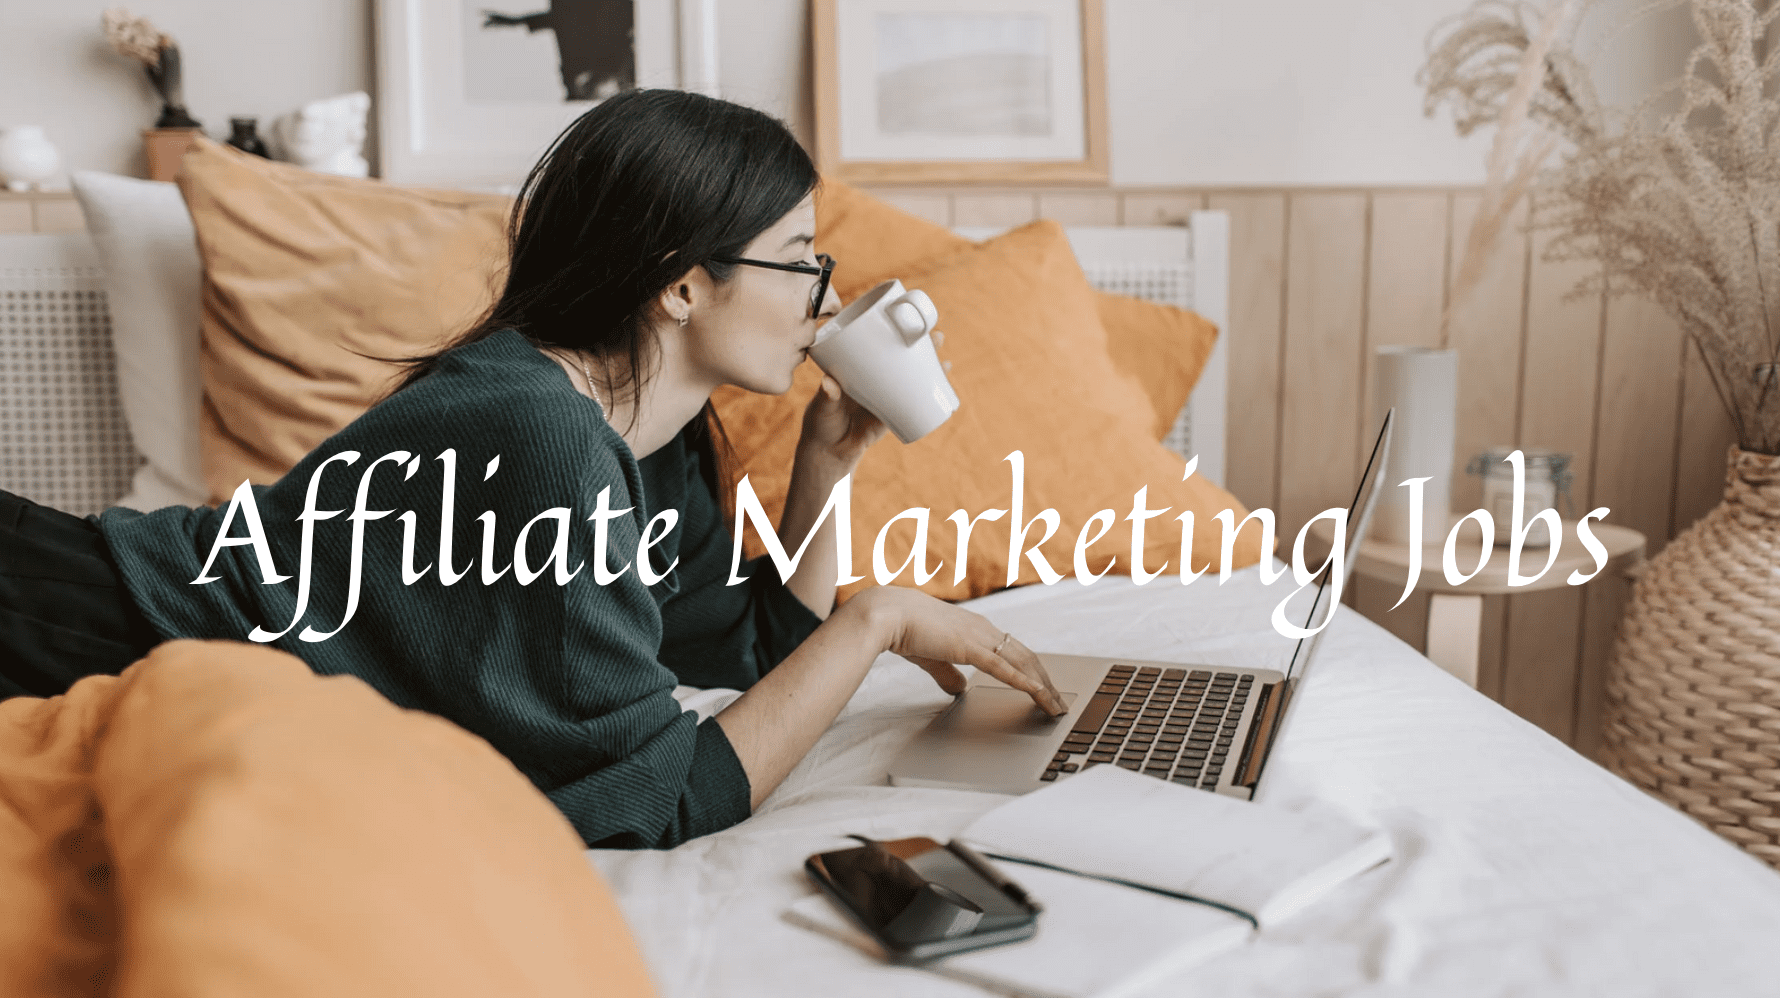 Find Affiliate Marketing Jobs